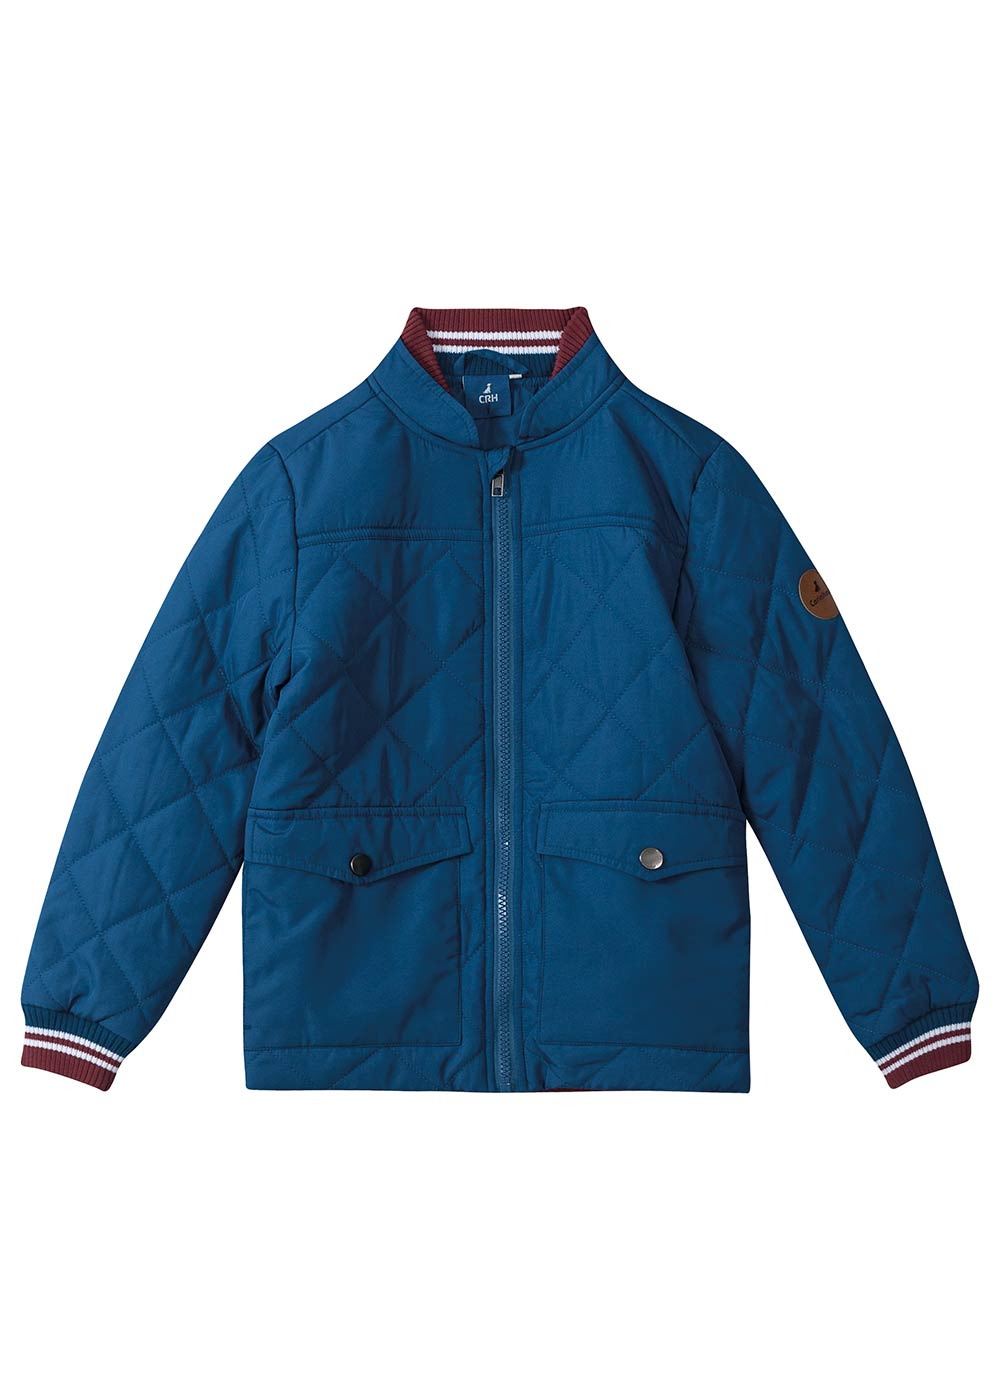 Jaqueta Infantil Masculino Inverno Azul Matelassê - Carinhoso